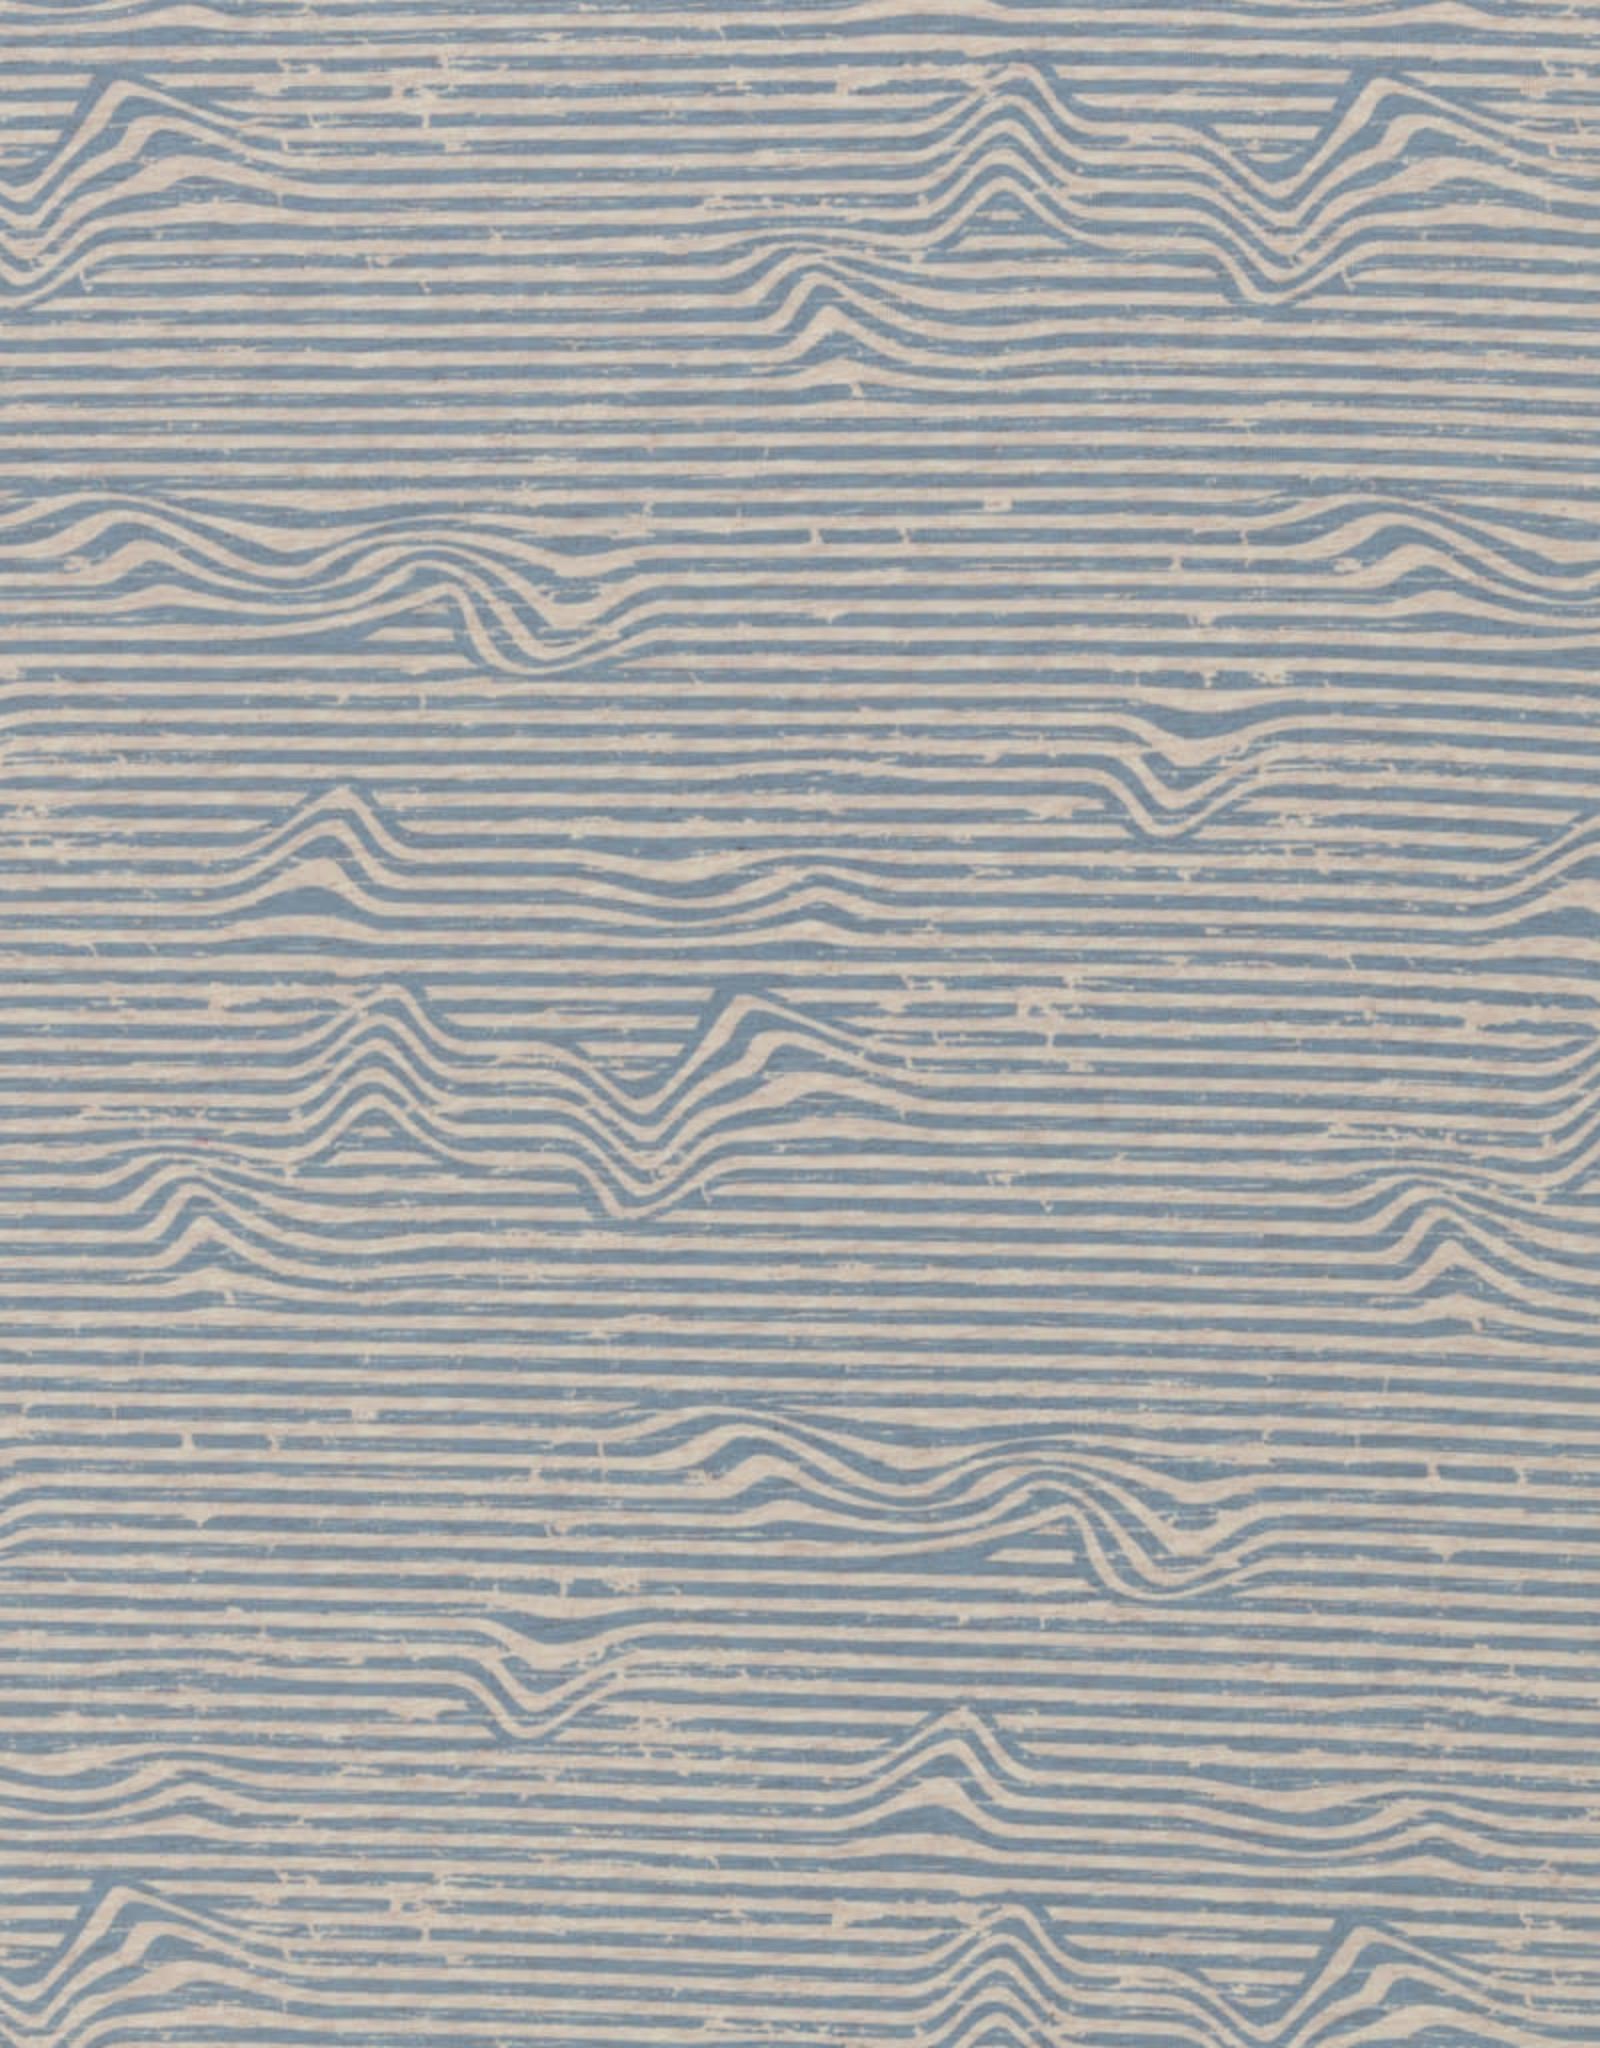 Stripes light blue